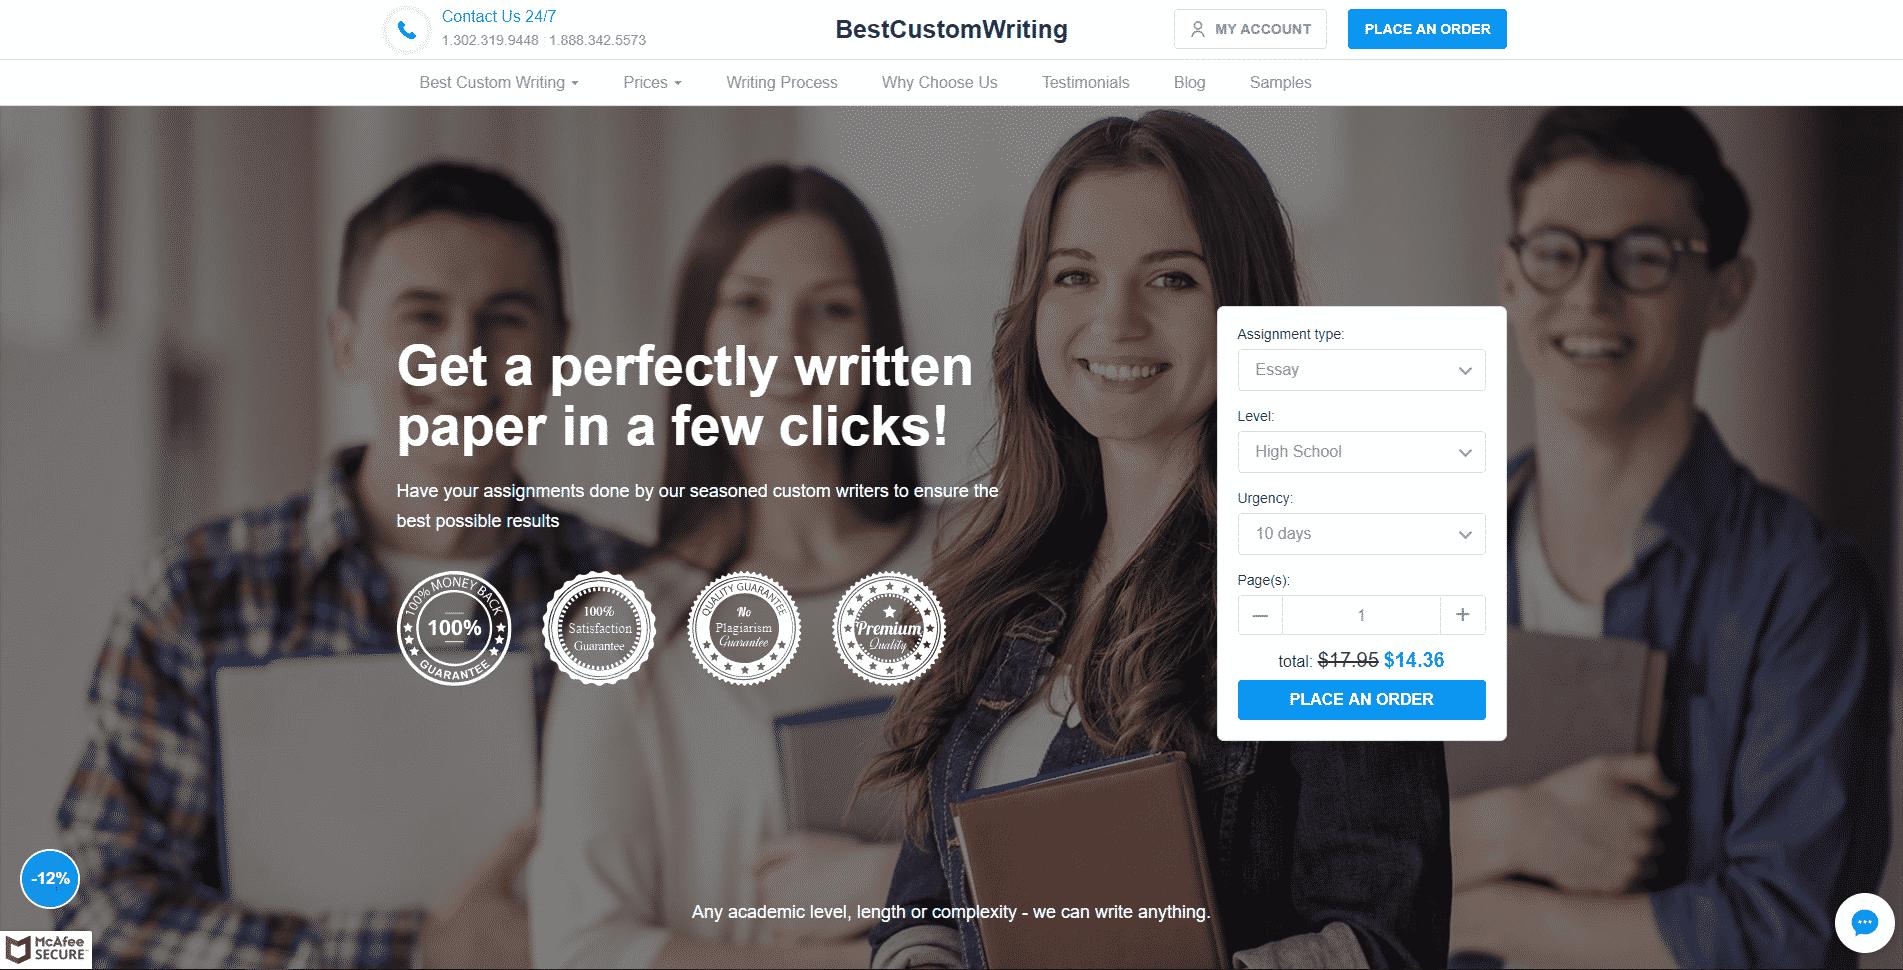 Bestcustomwriting.com Review